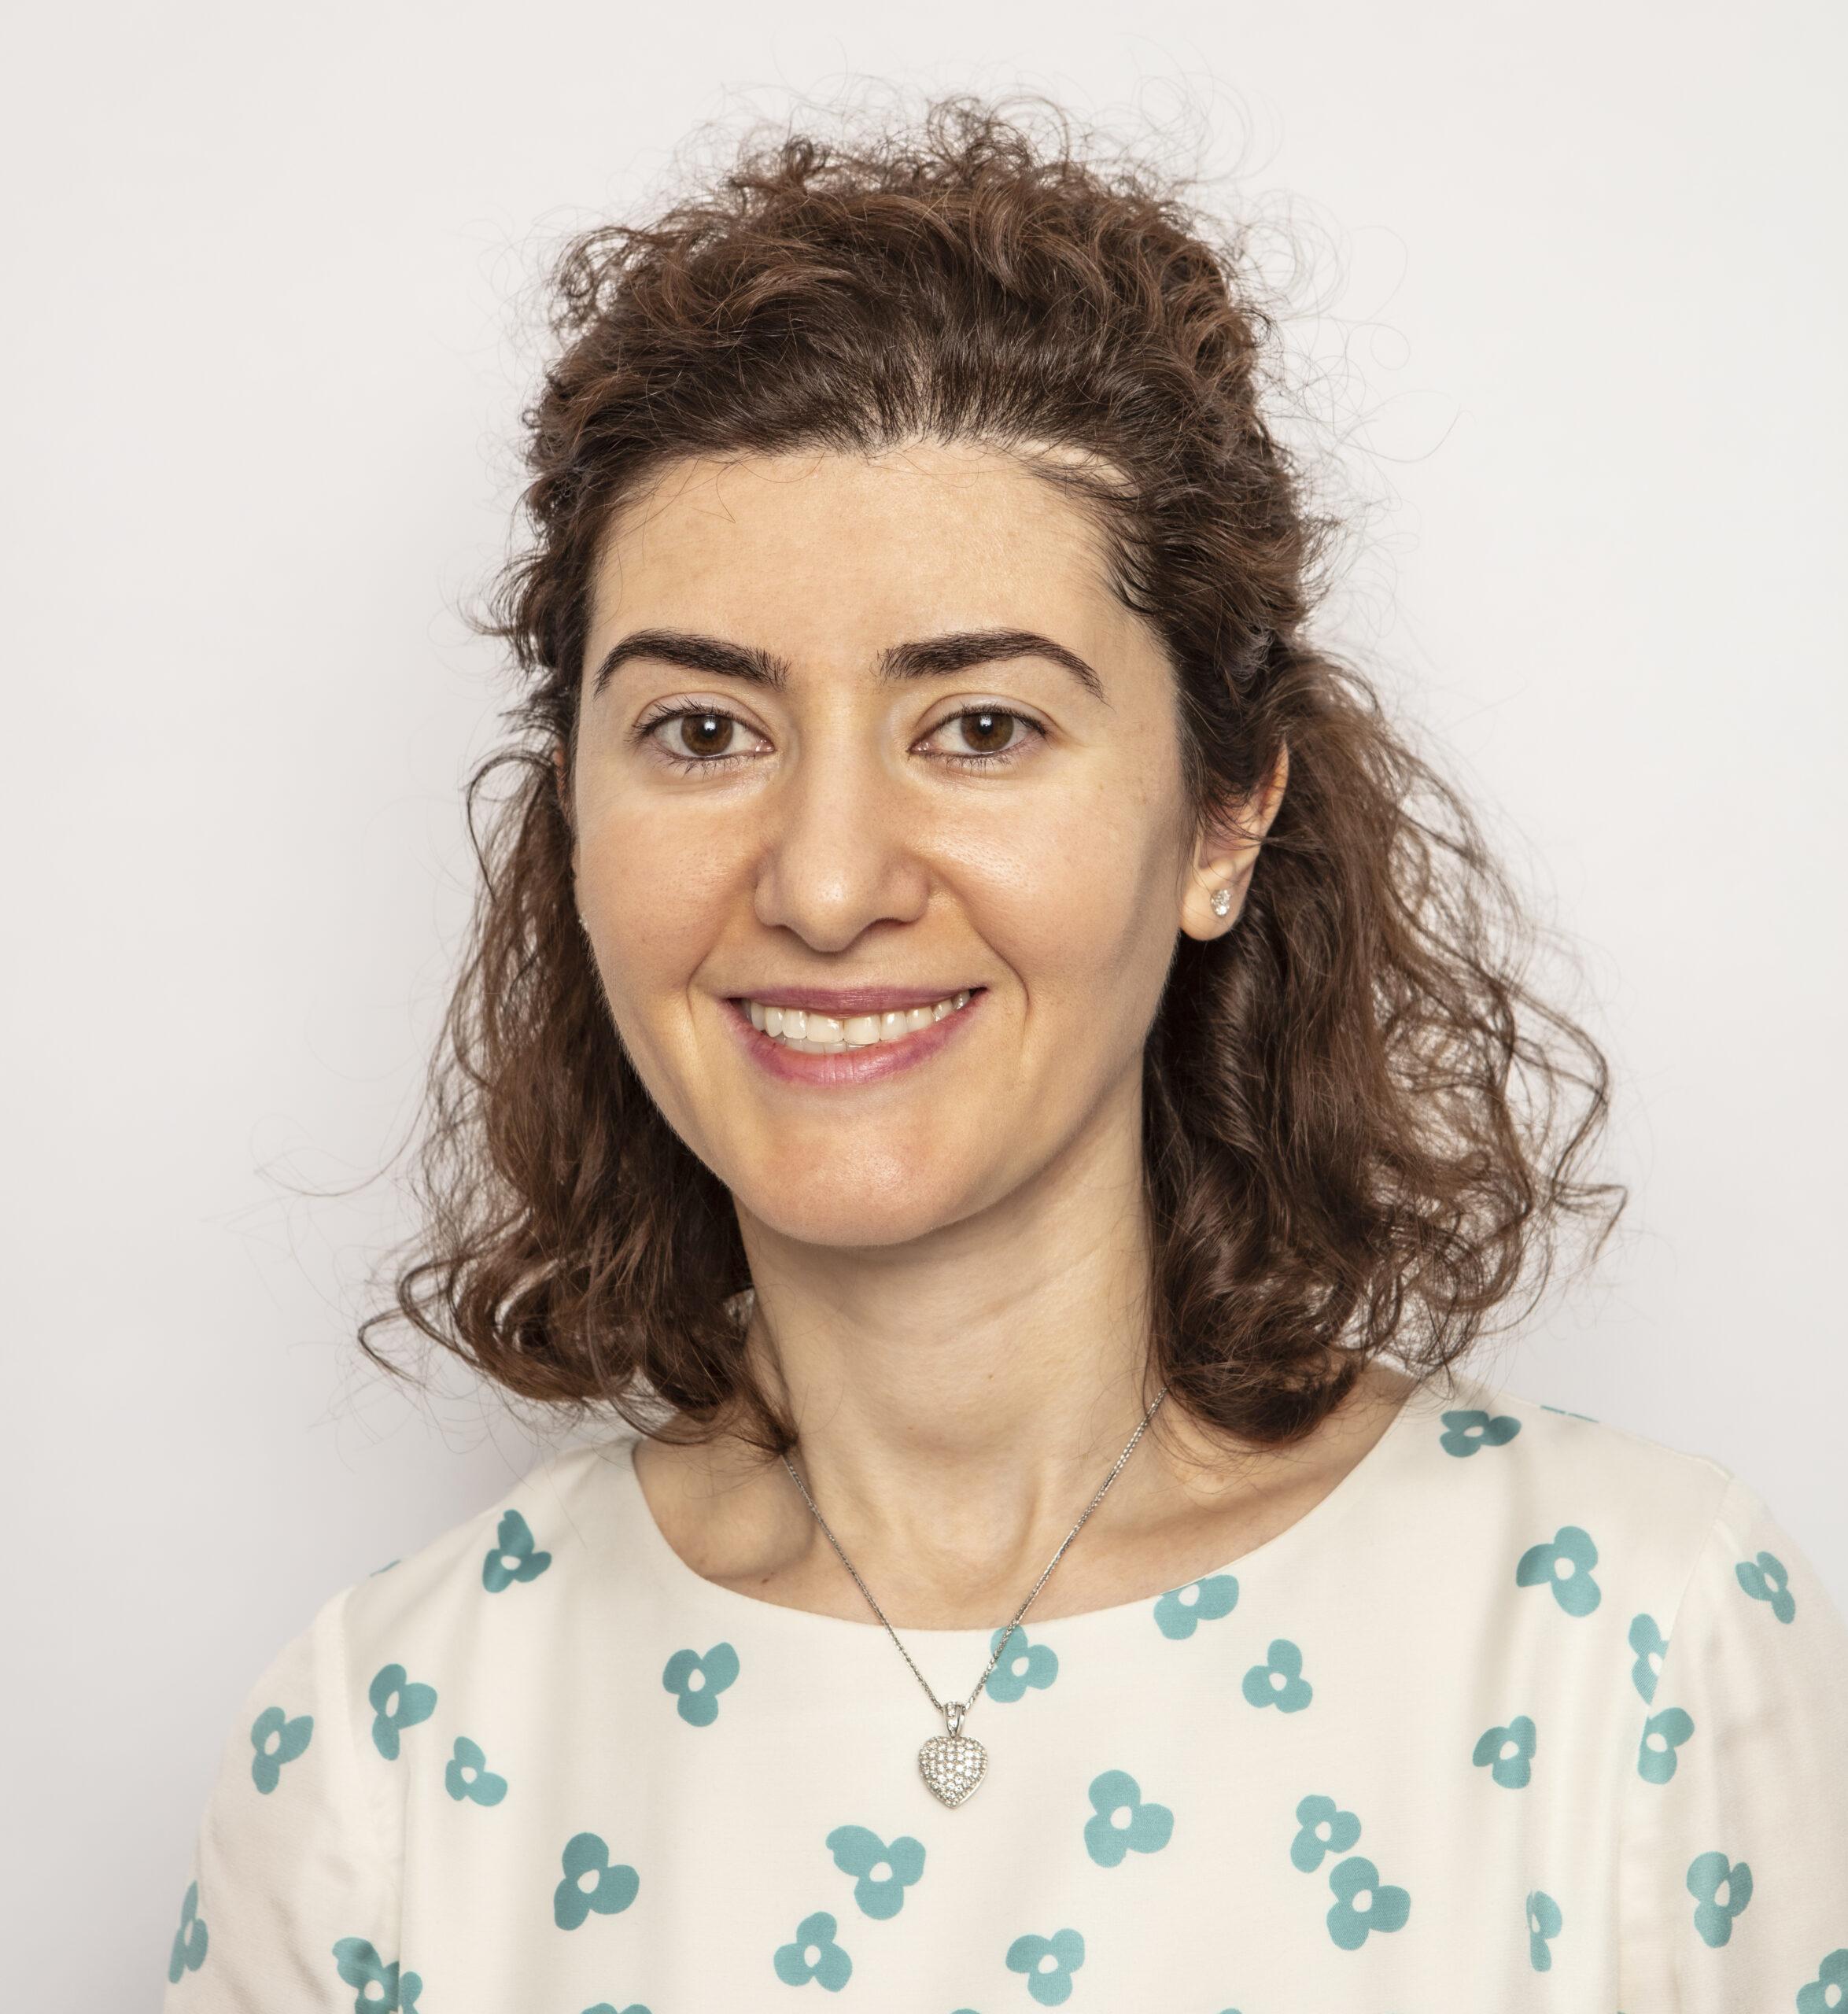 Maria Chahrour portrait